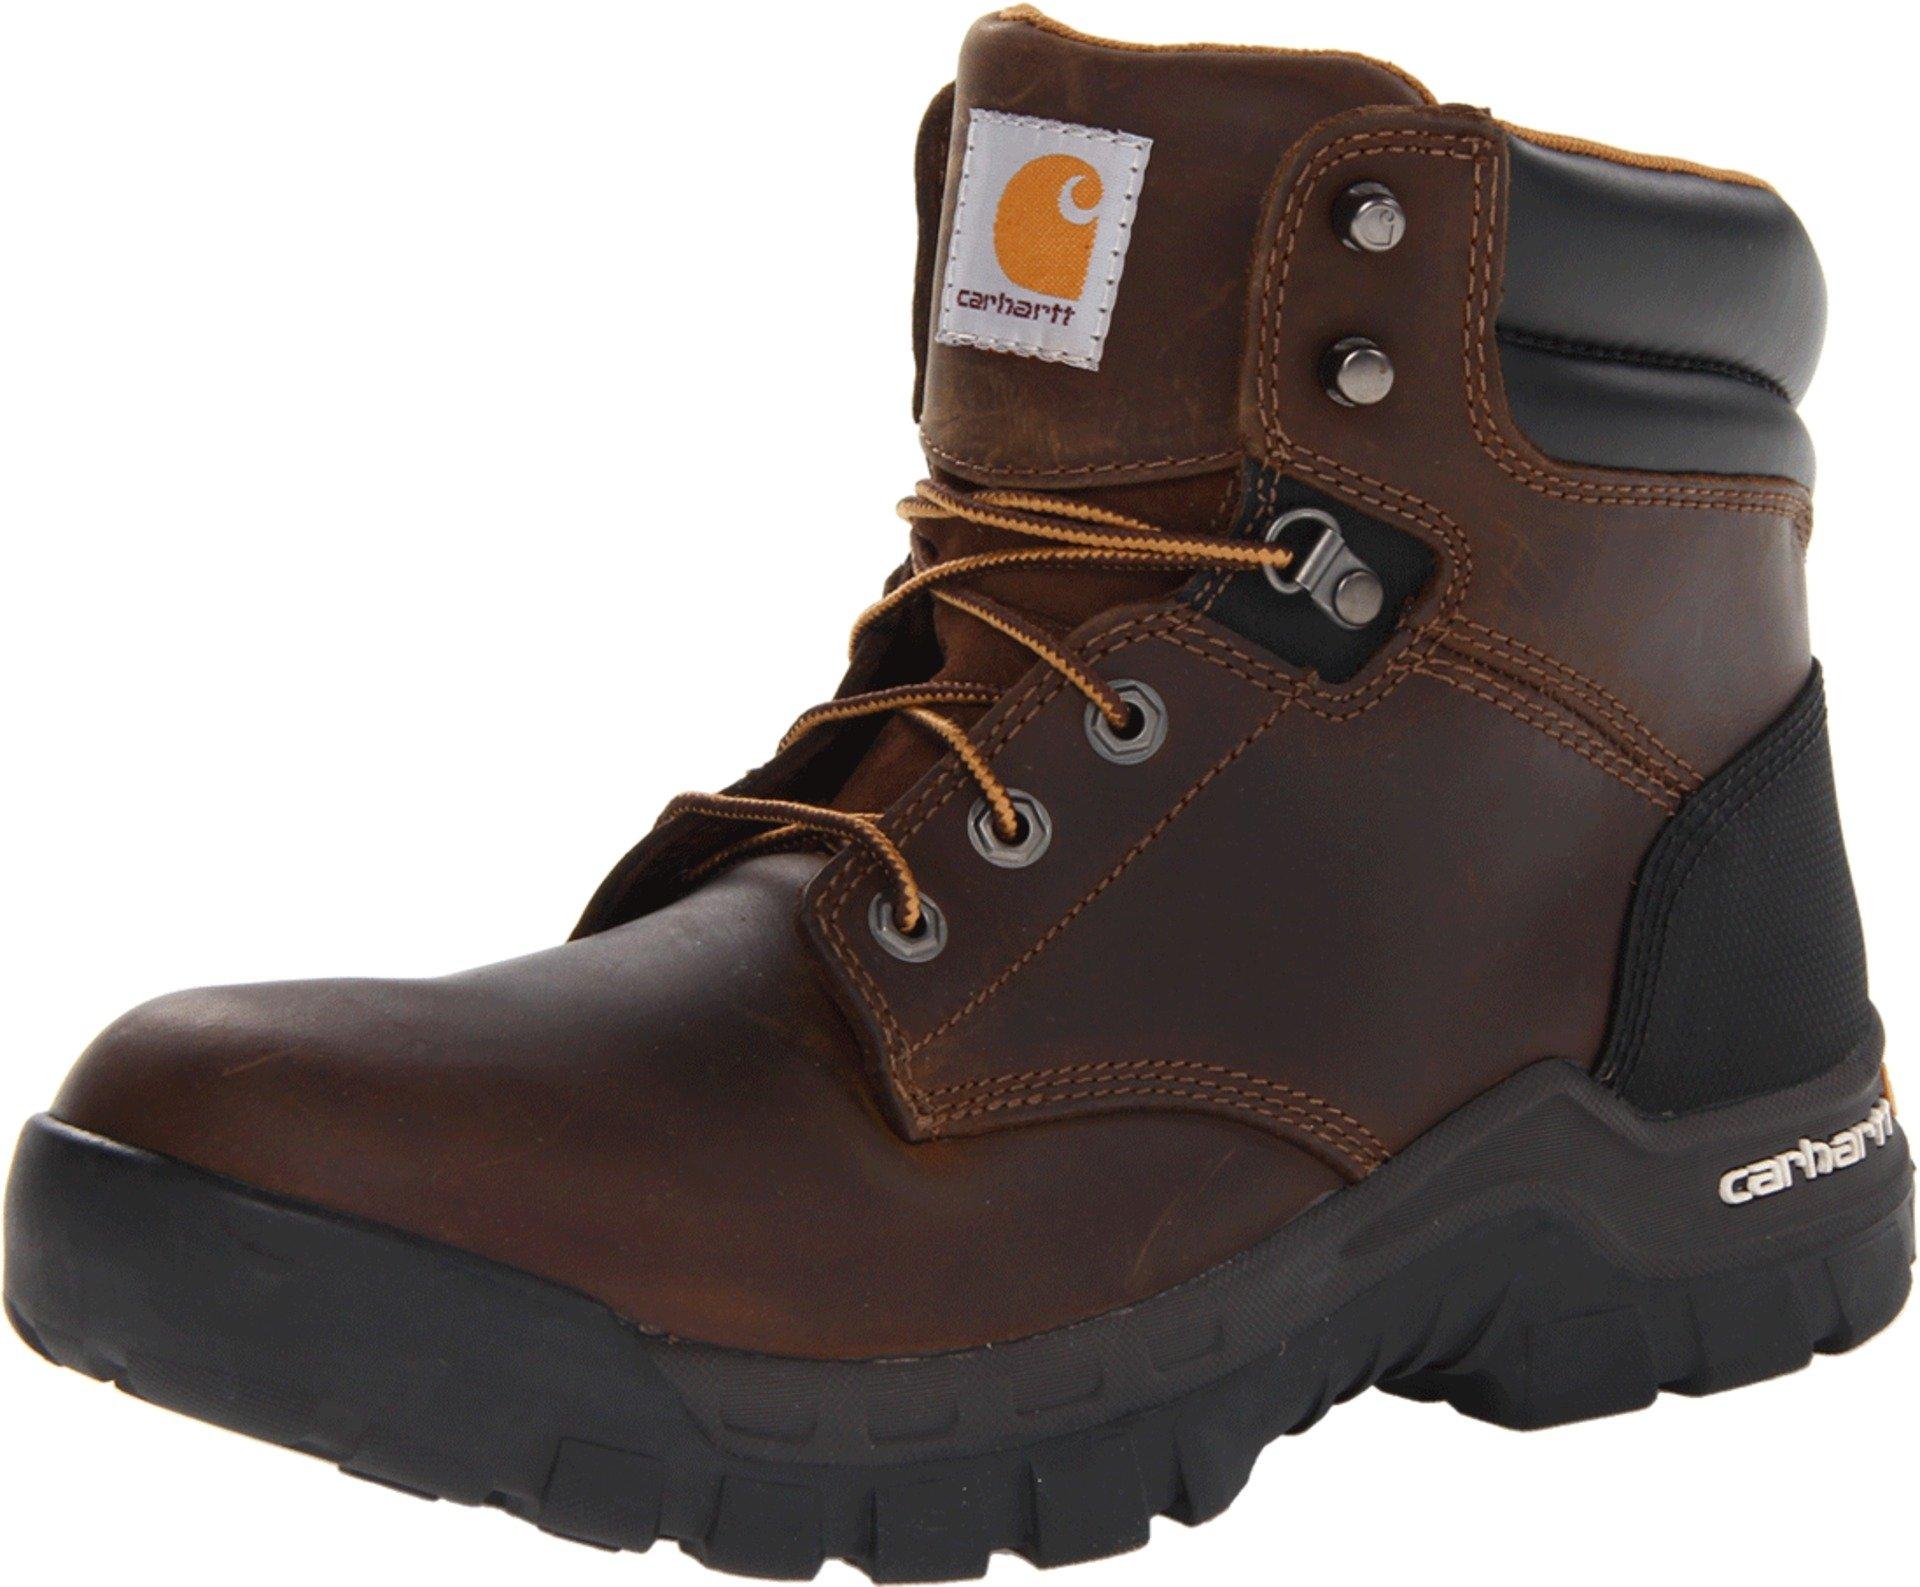 Carhartt Men's 6'' Rugged Flex Waterproof Soft Toe Work Boot CMF6066,Brown Oil Tanned Leather,11 W US